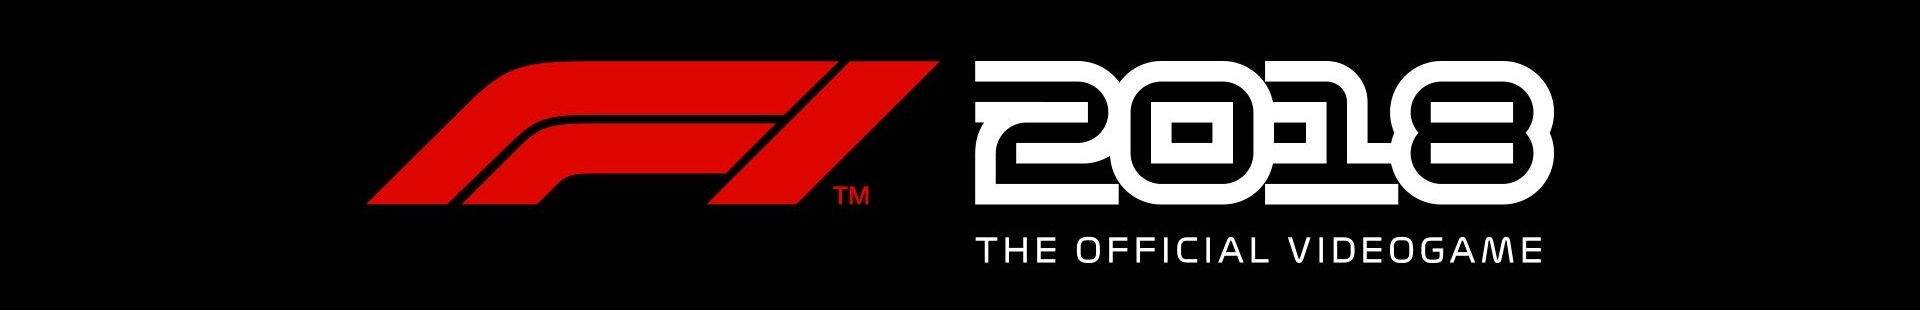 F1 2018 Notebook and Desktop Benchmarks - NotebookCheck net Reviews